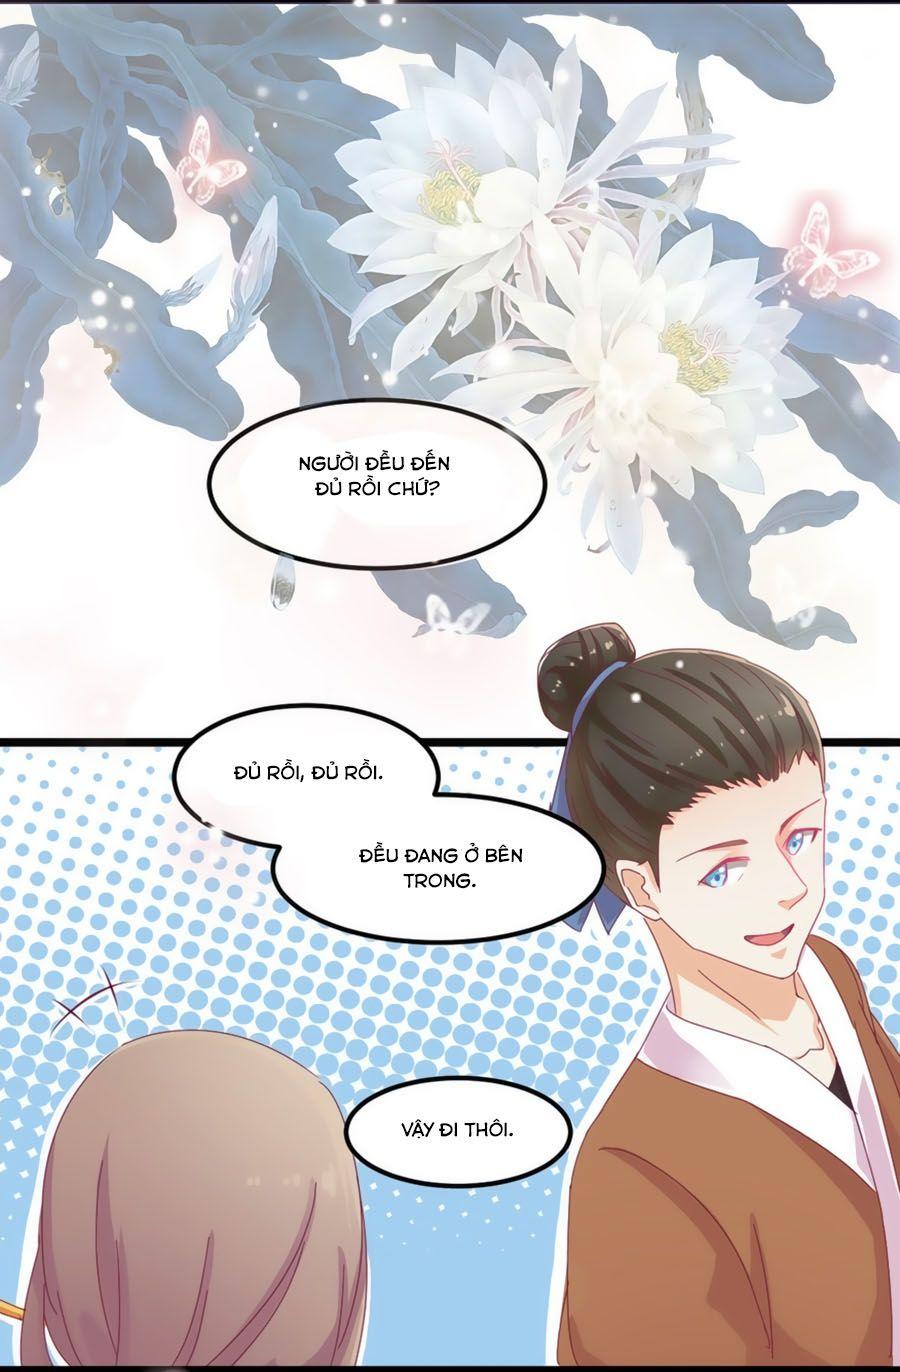 Ngọc Vi Mai chap 3 - Trang 5